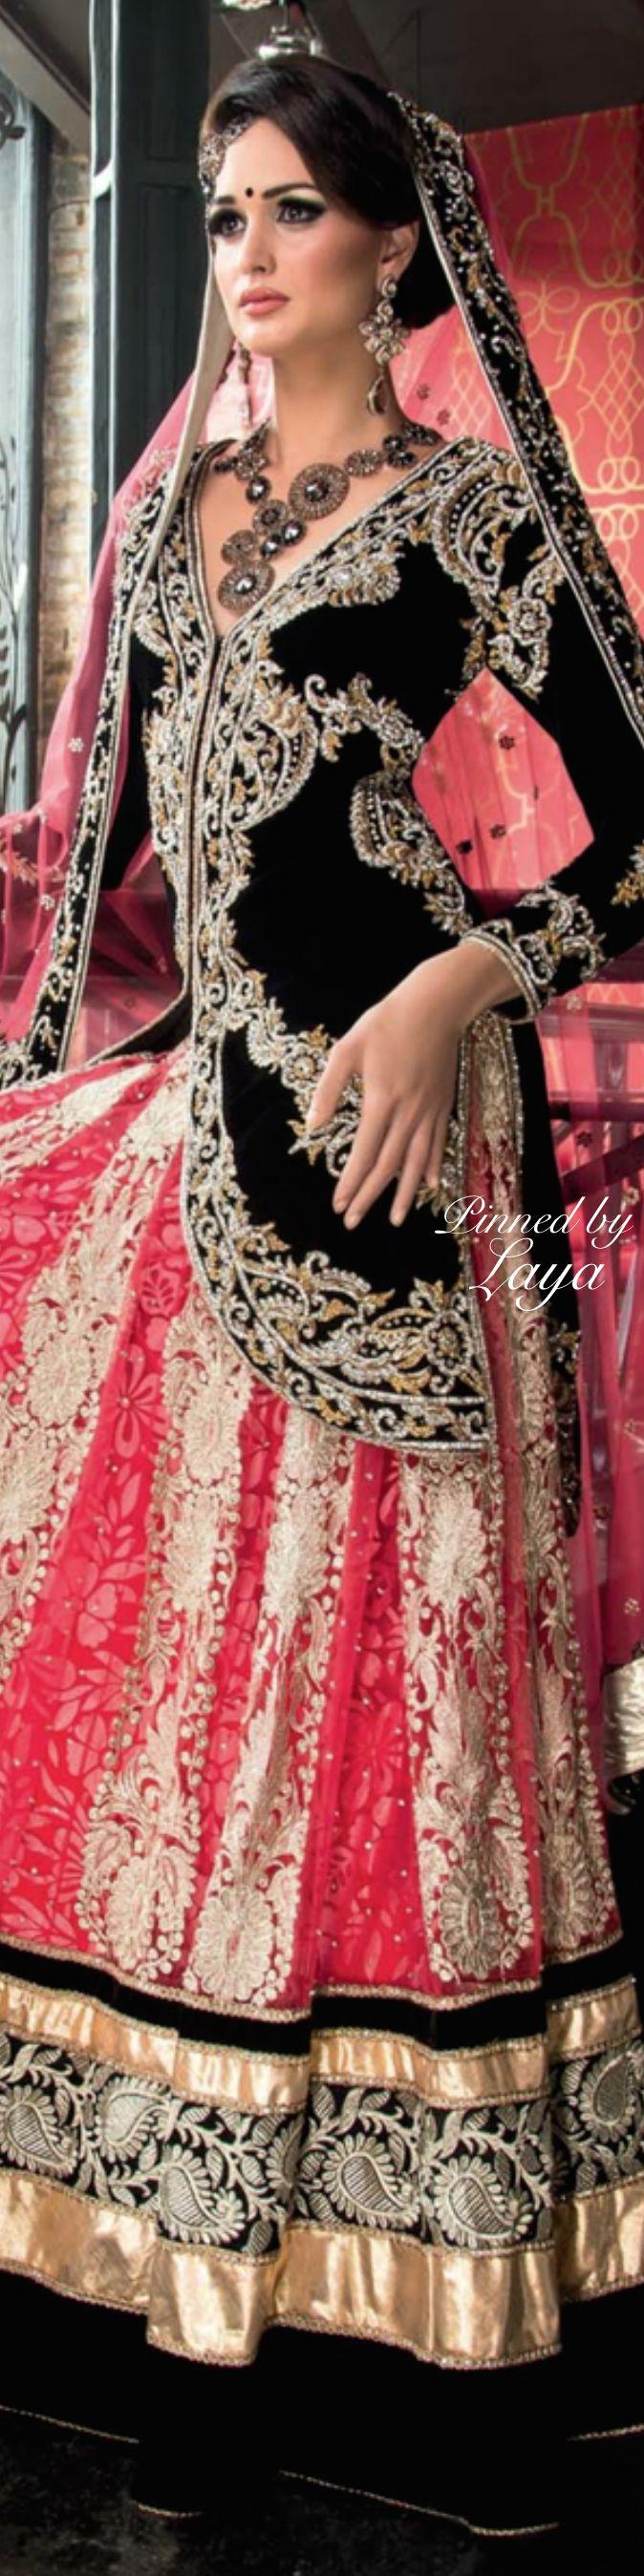 713 best images about ** Brides / dulhan Dress ** on ...